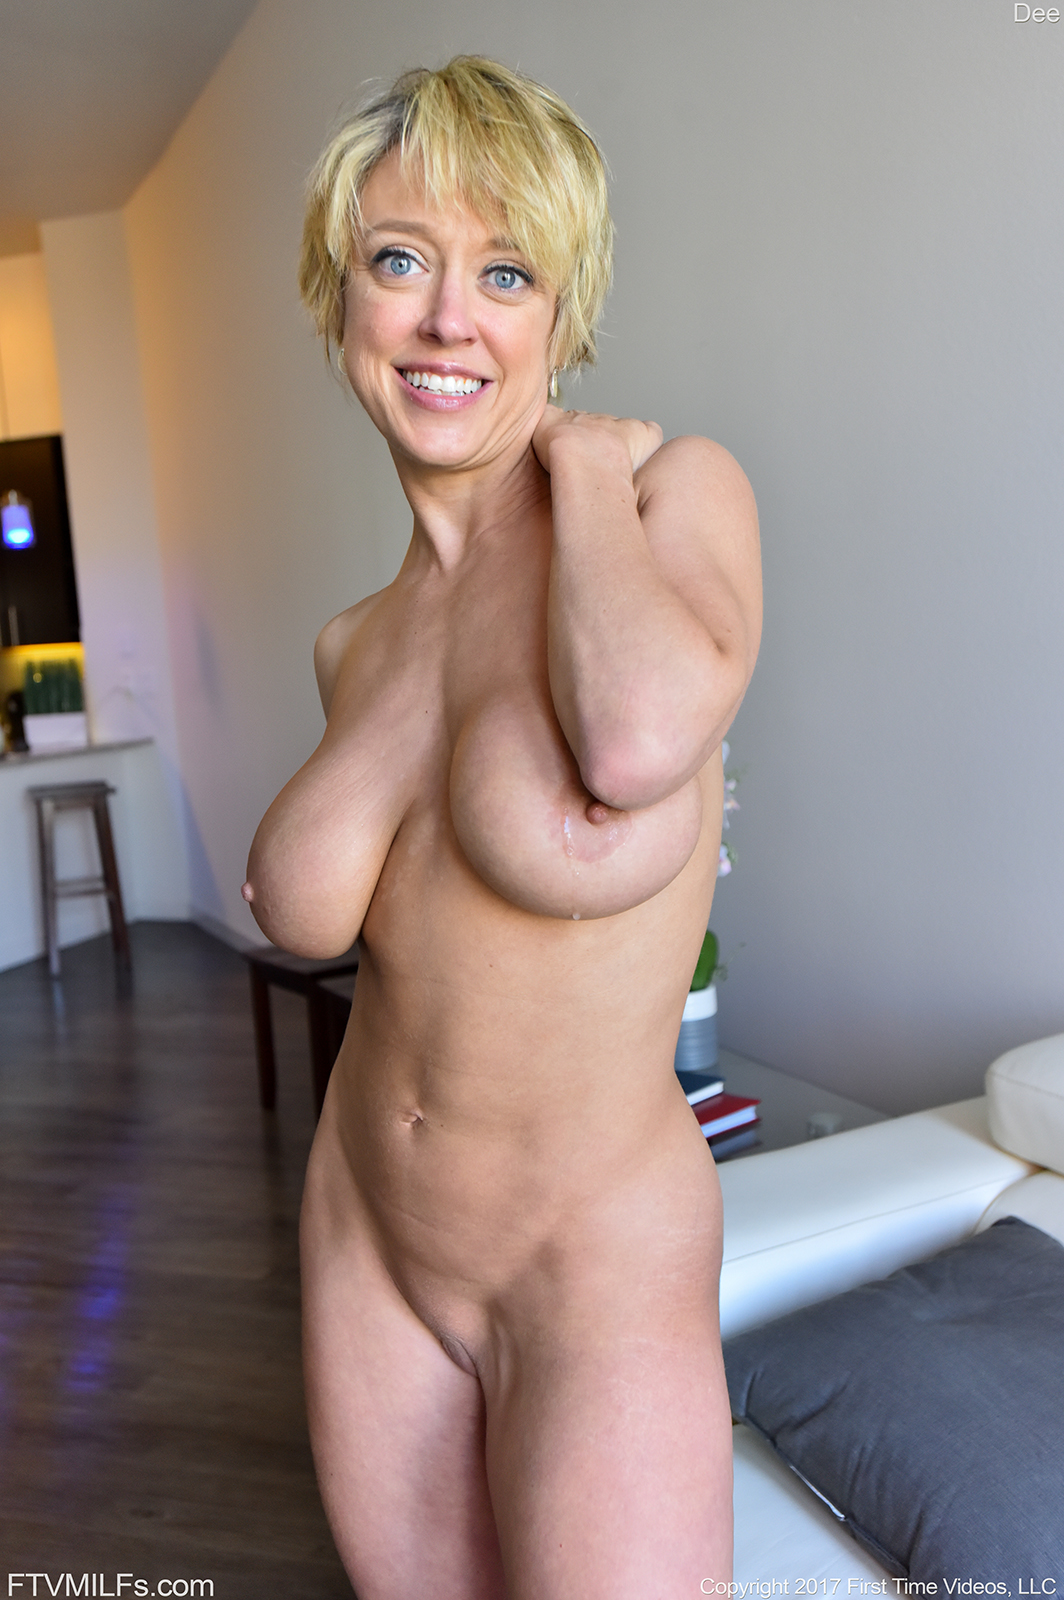 naked hotmom with boy